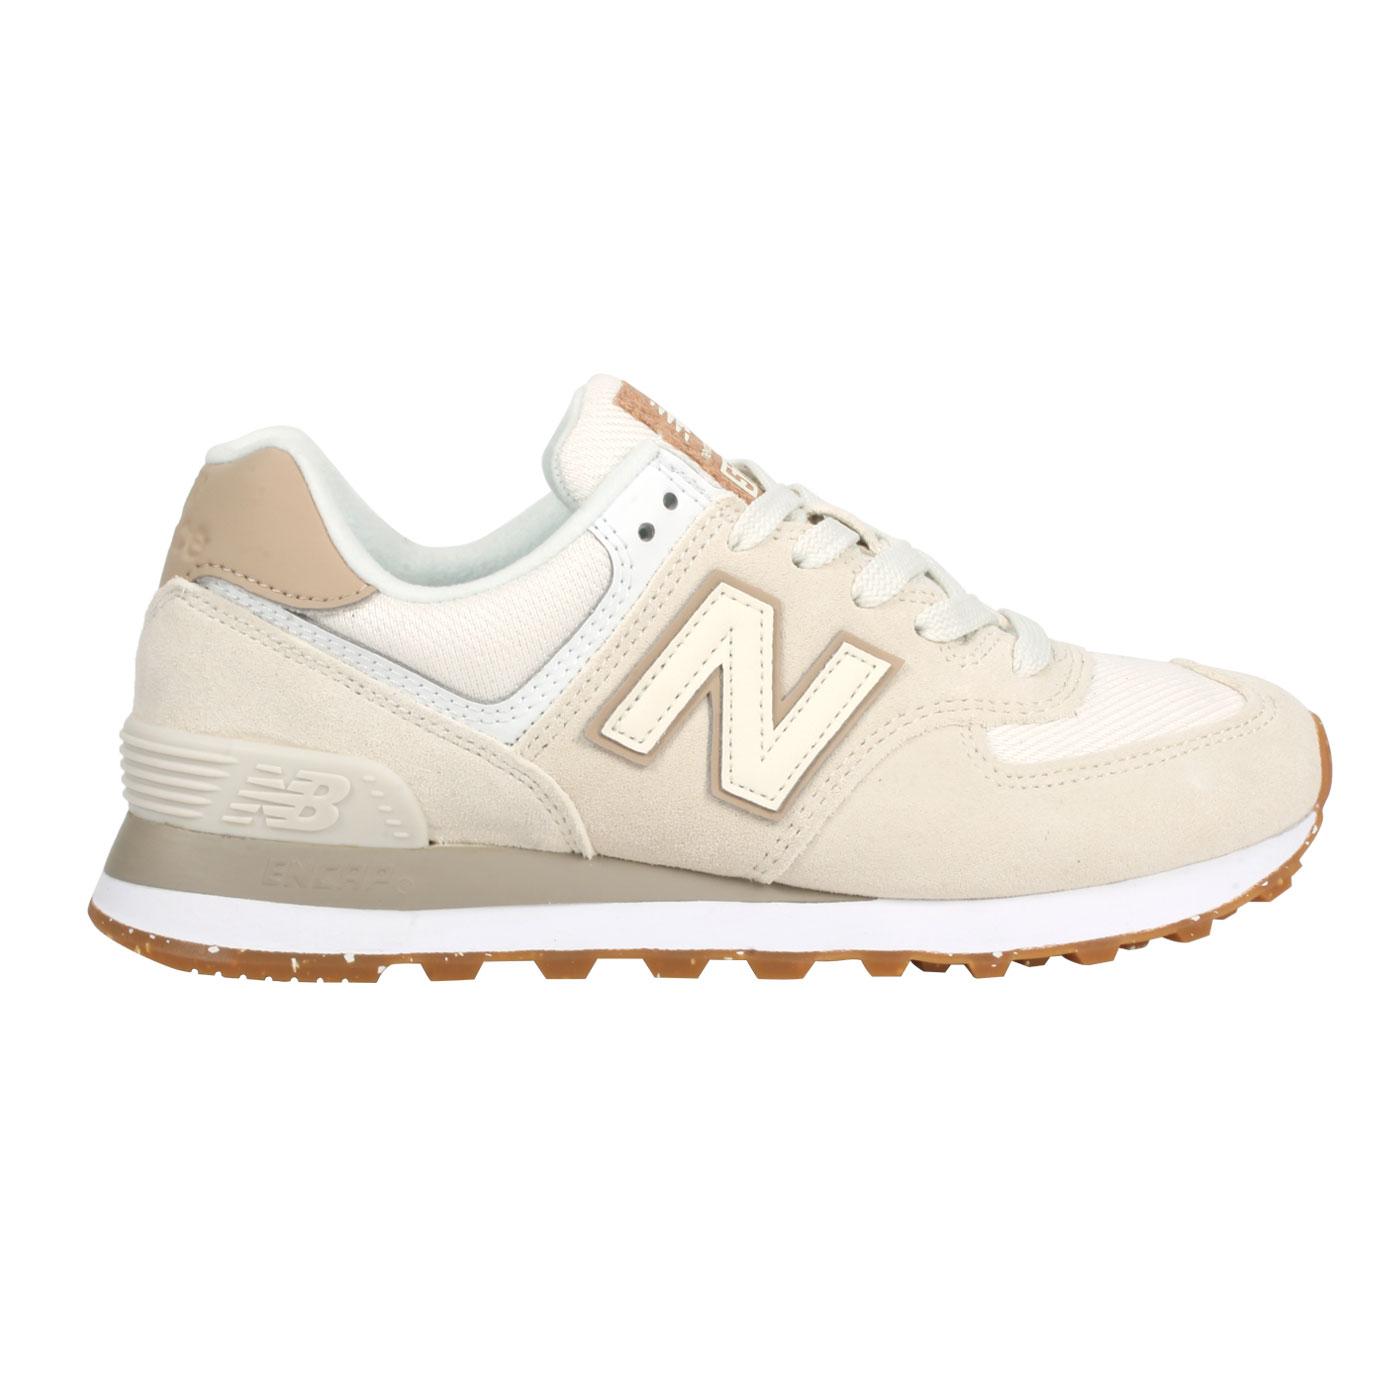 NEW BALANCE 女款復古運動鞋 WL574SL2 - 白淺棕